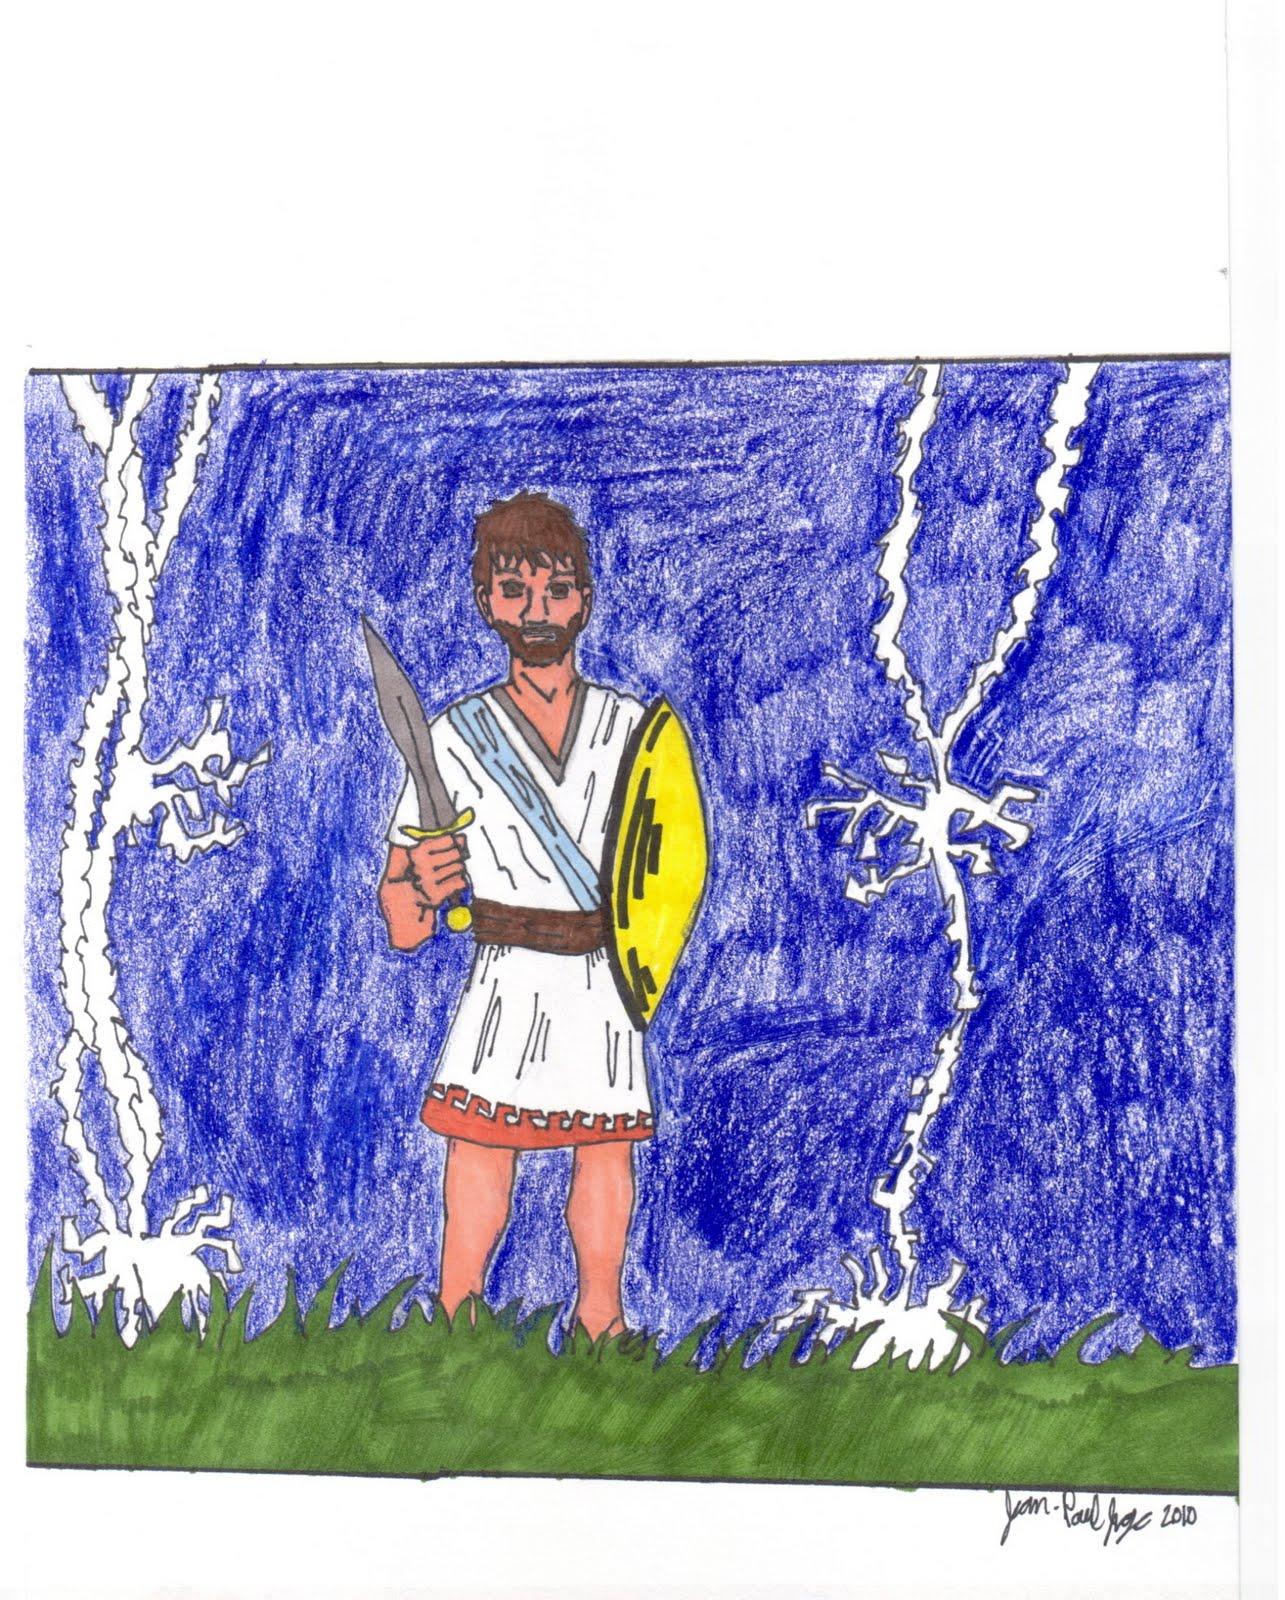 http://4.bp.blogspot.com/_rQypykdZpHQ/S7Sfntb7EUI/AAAAAAAAA64/pTfr19o0178/s1600/george+oconner+drawing.jpg